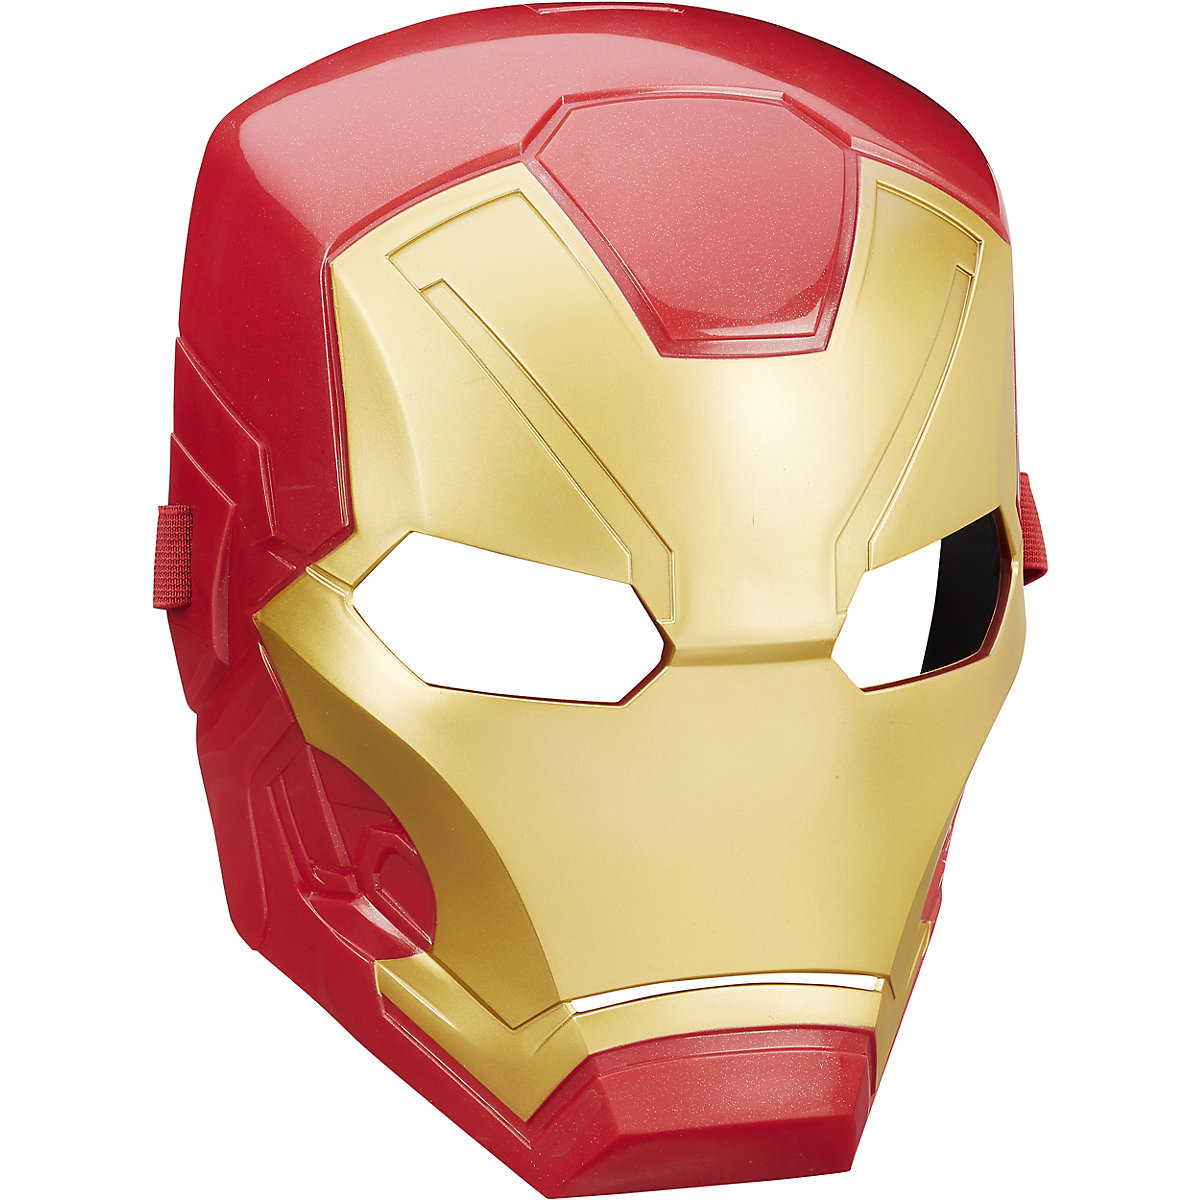 Hasbro  Mask 5064751 Playsets Interactive Masks Aprilpromo Avengers Marvel Iron Man MTpromo